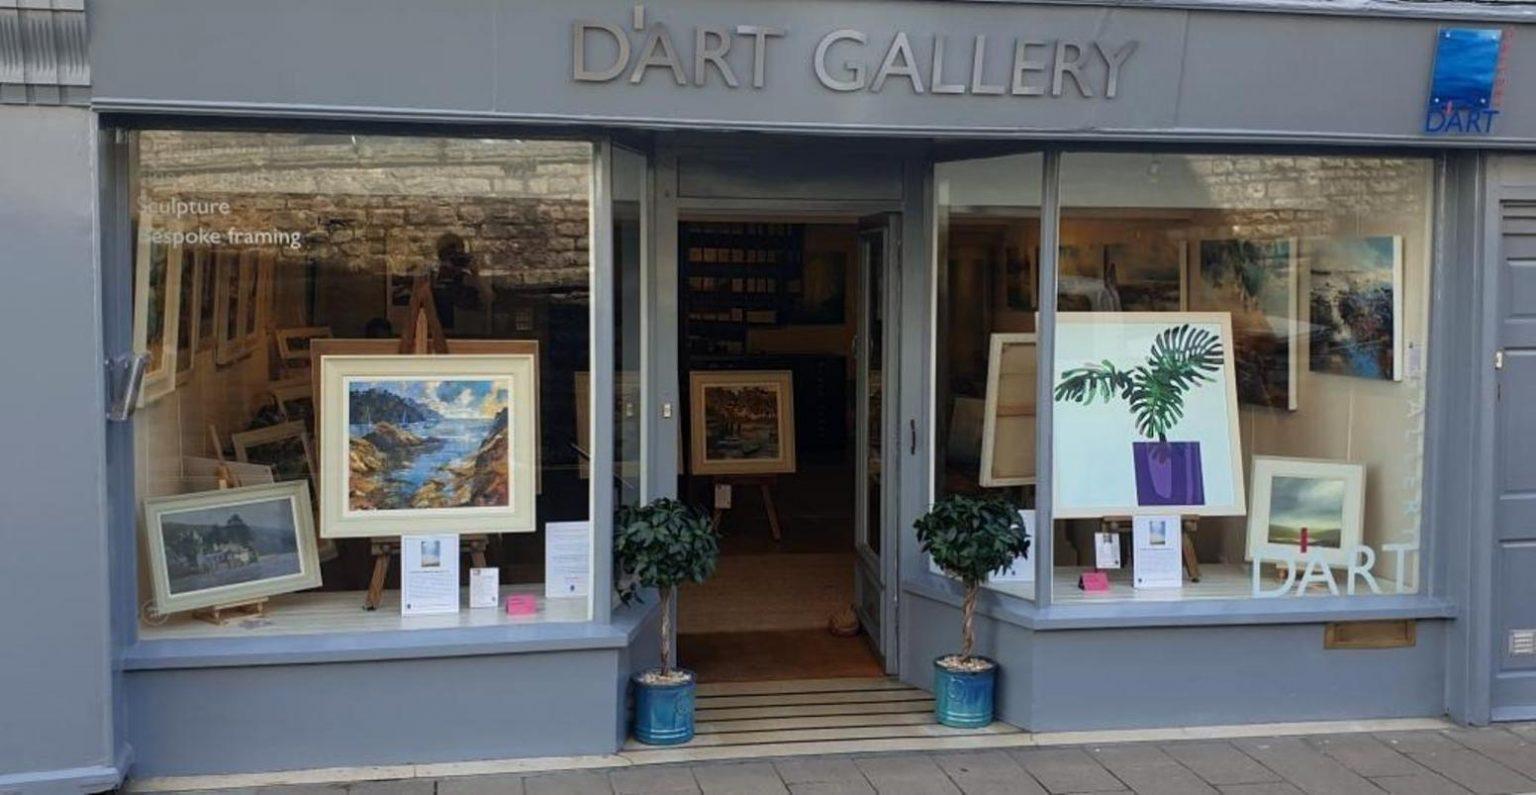 Dart Gallery